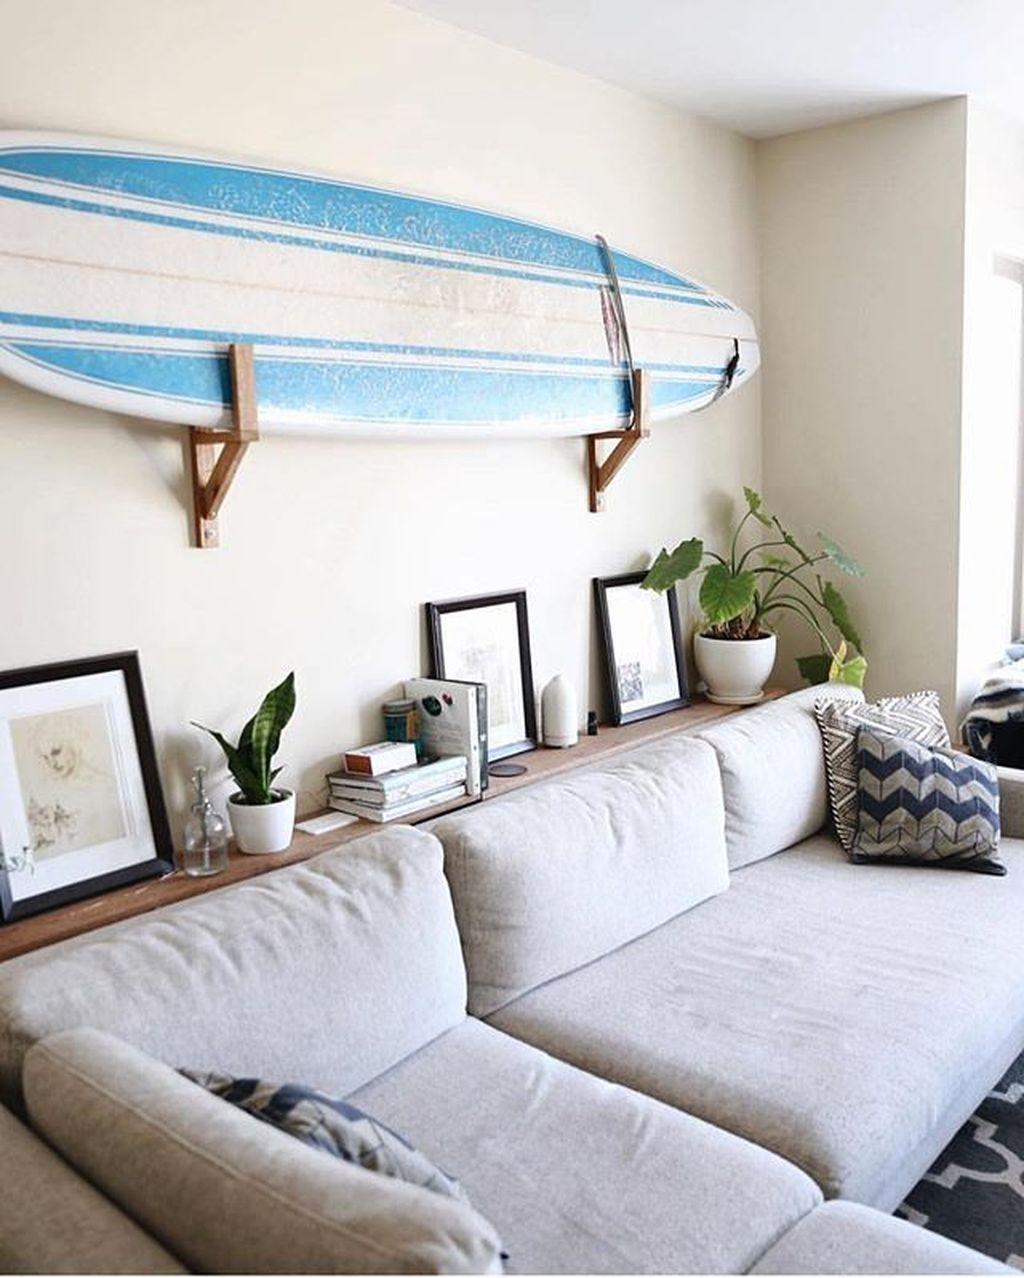 30 awesome room design ideas for guys house home home decor rh pinterest com awesome room painting designs awesome room painting designs